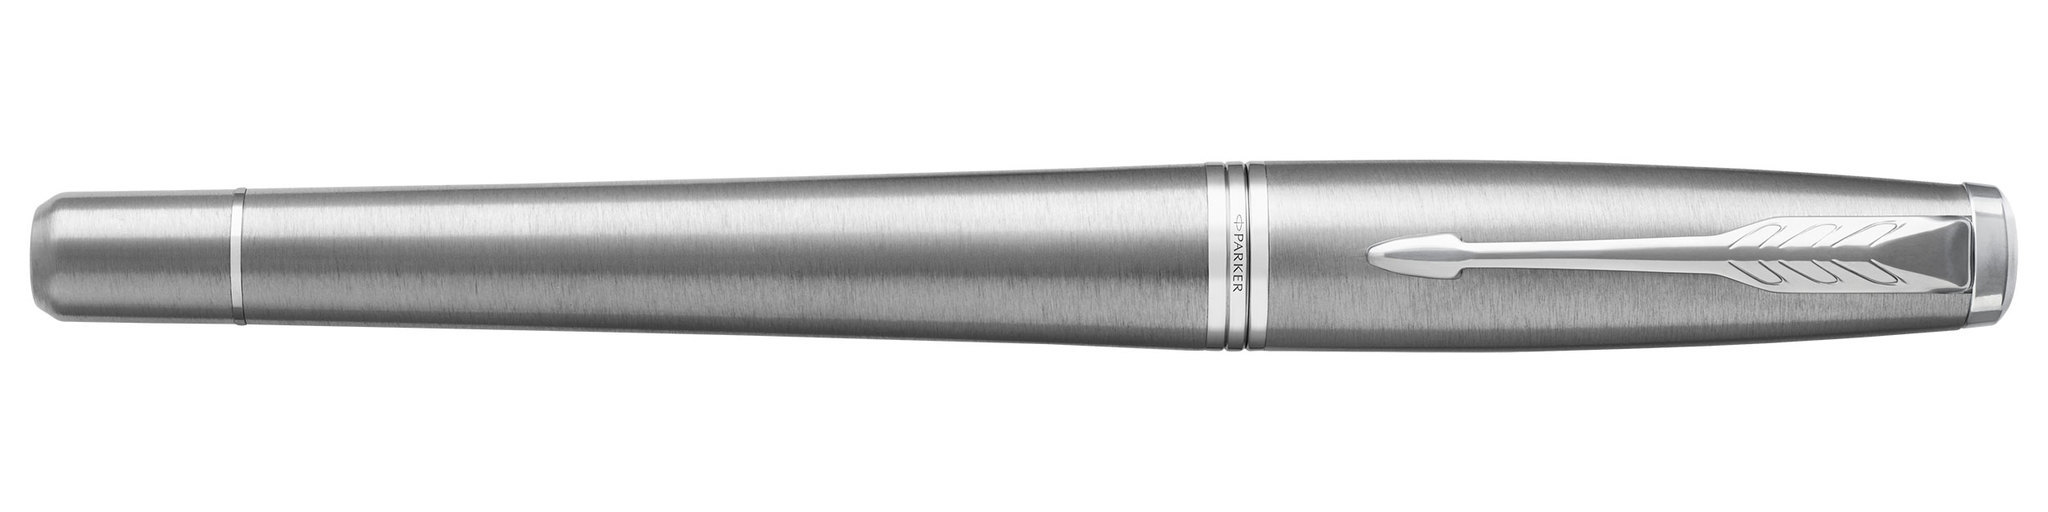 Parker Urban Core - Metro Metallic CT, перьевая ручка, F